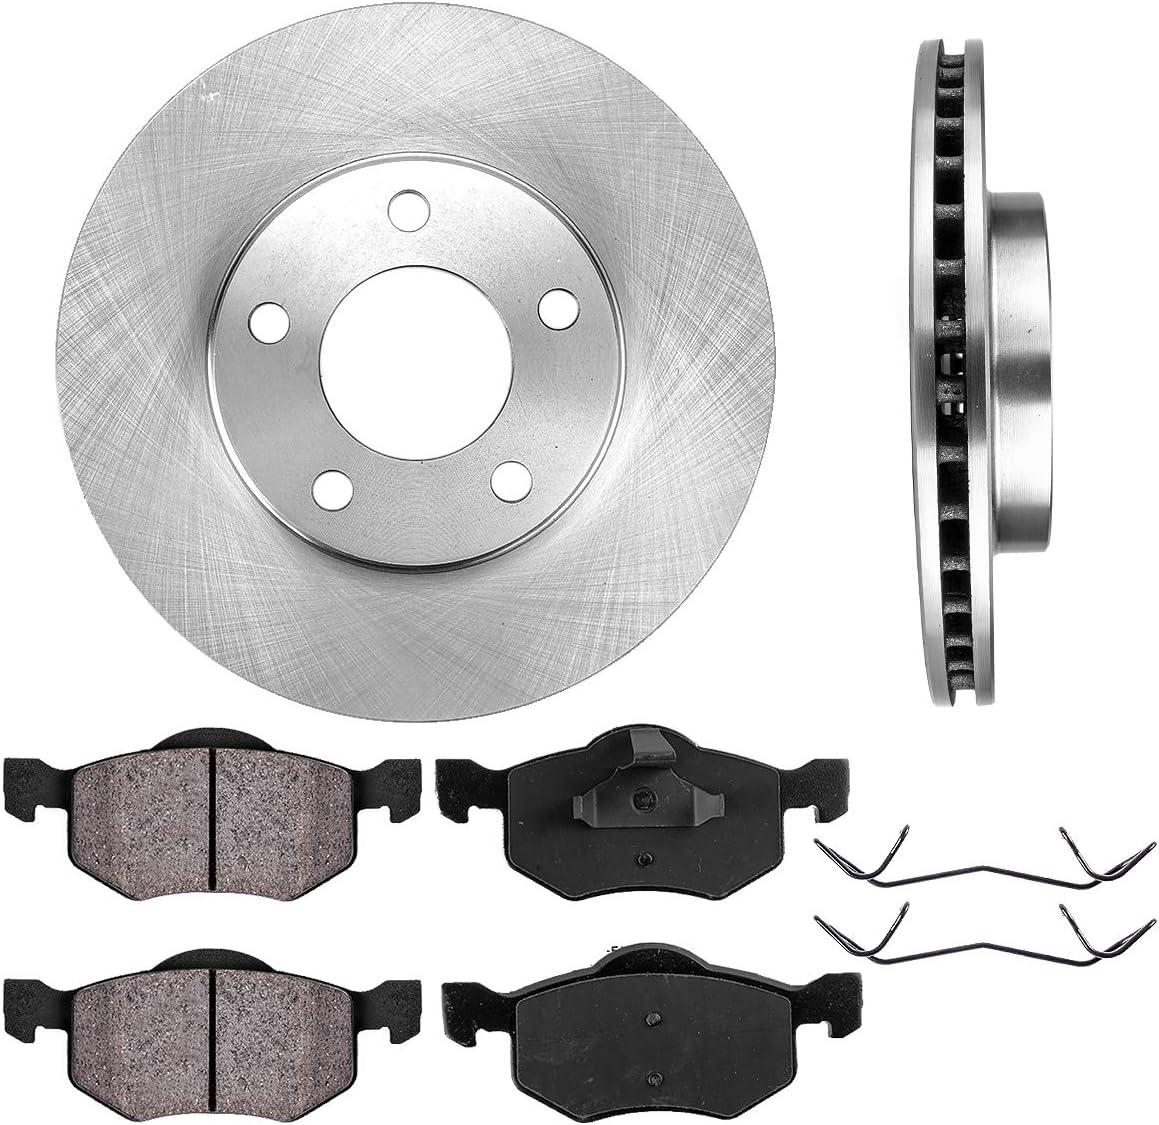 High-End 5lug Fits: Escape Mariner Tribute Front Rotors 2 Brake Rotors